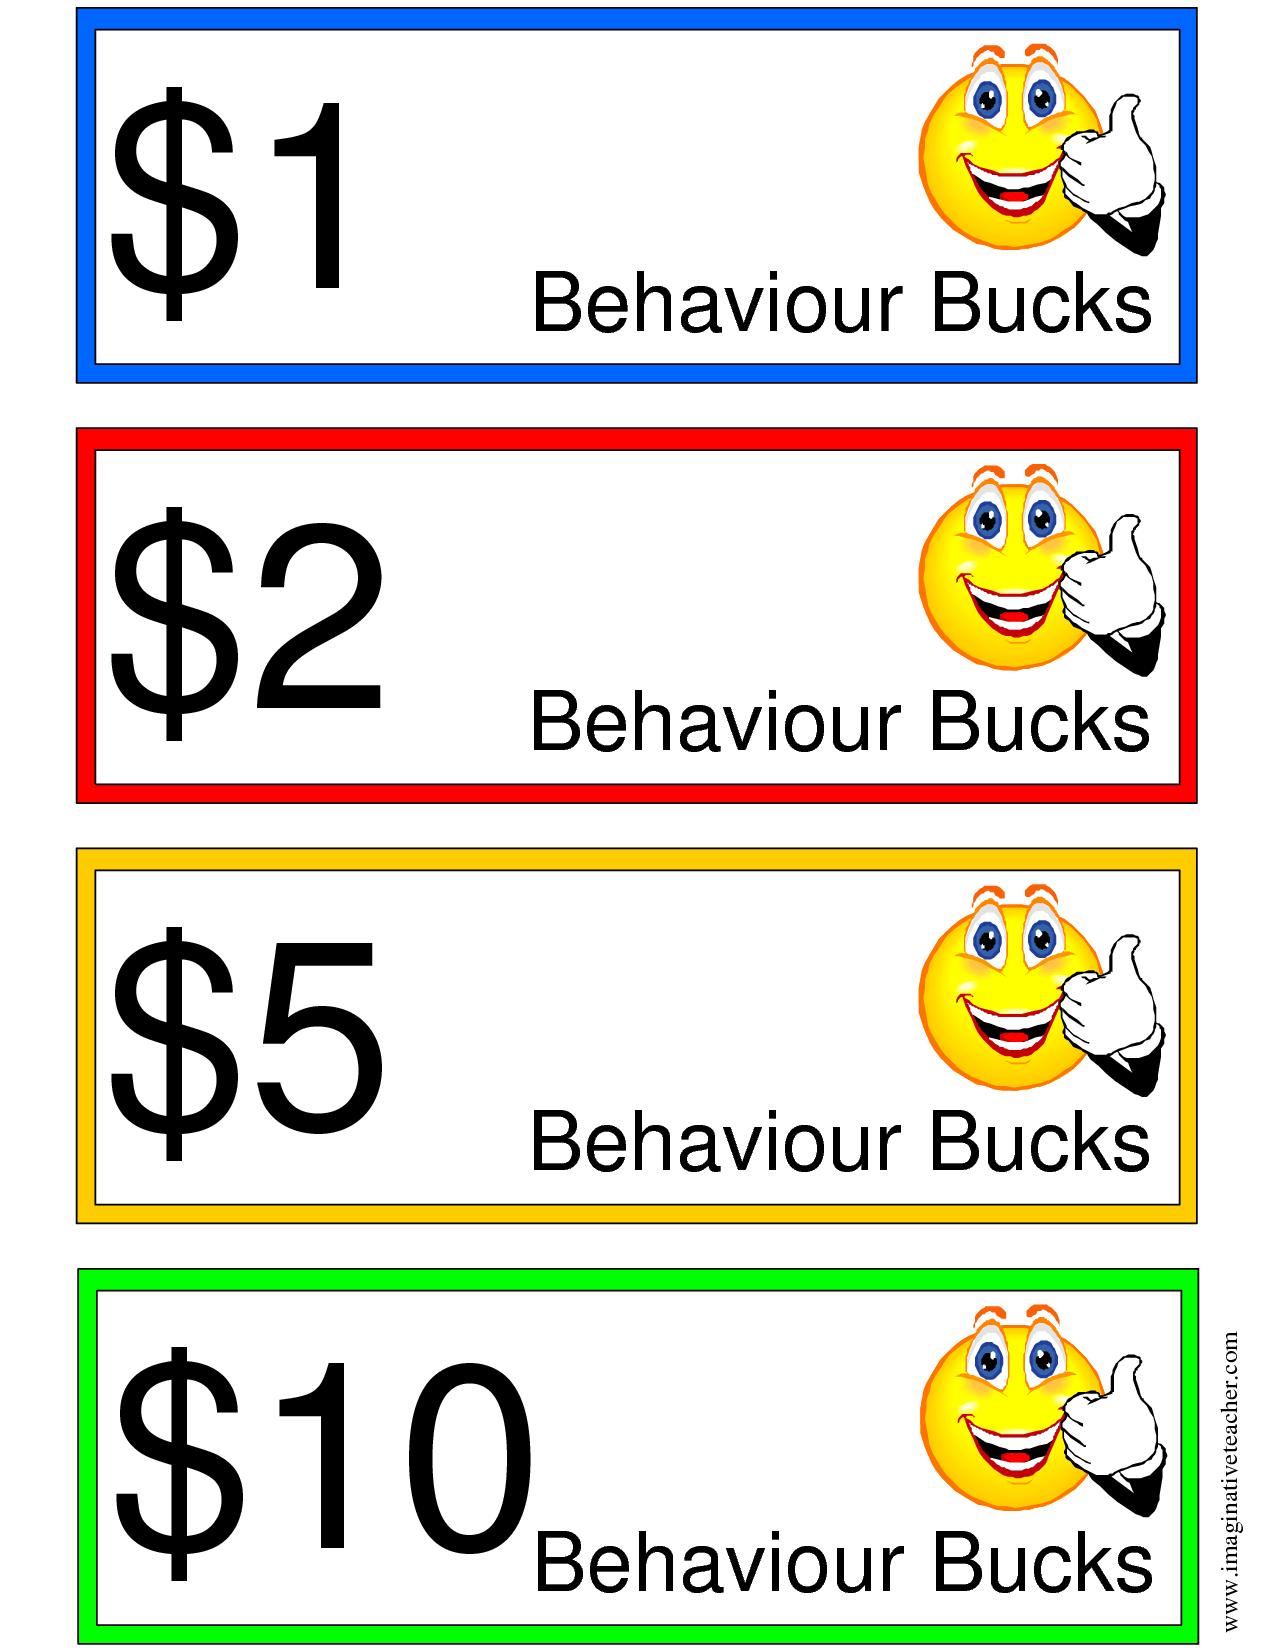 Good Behavior Bucks   Items Ship Free Printable Chores Print - Free Printable Chore Bucks